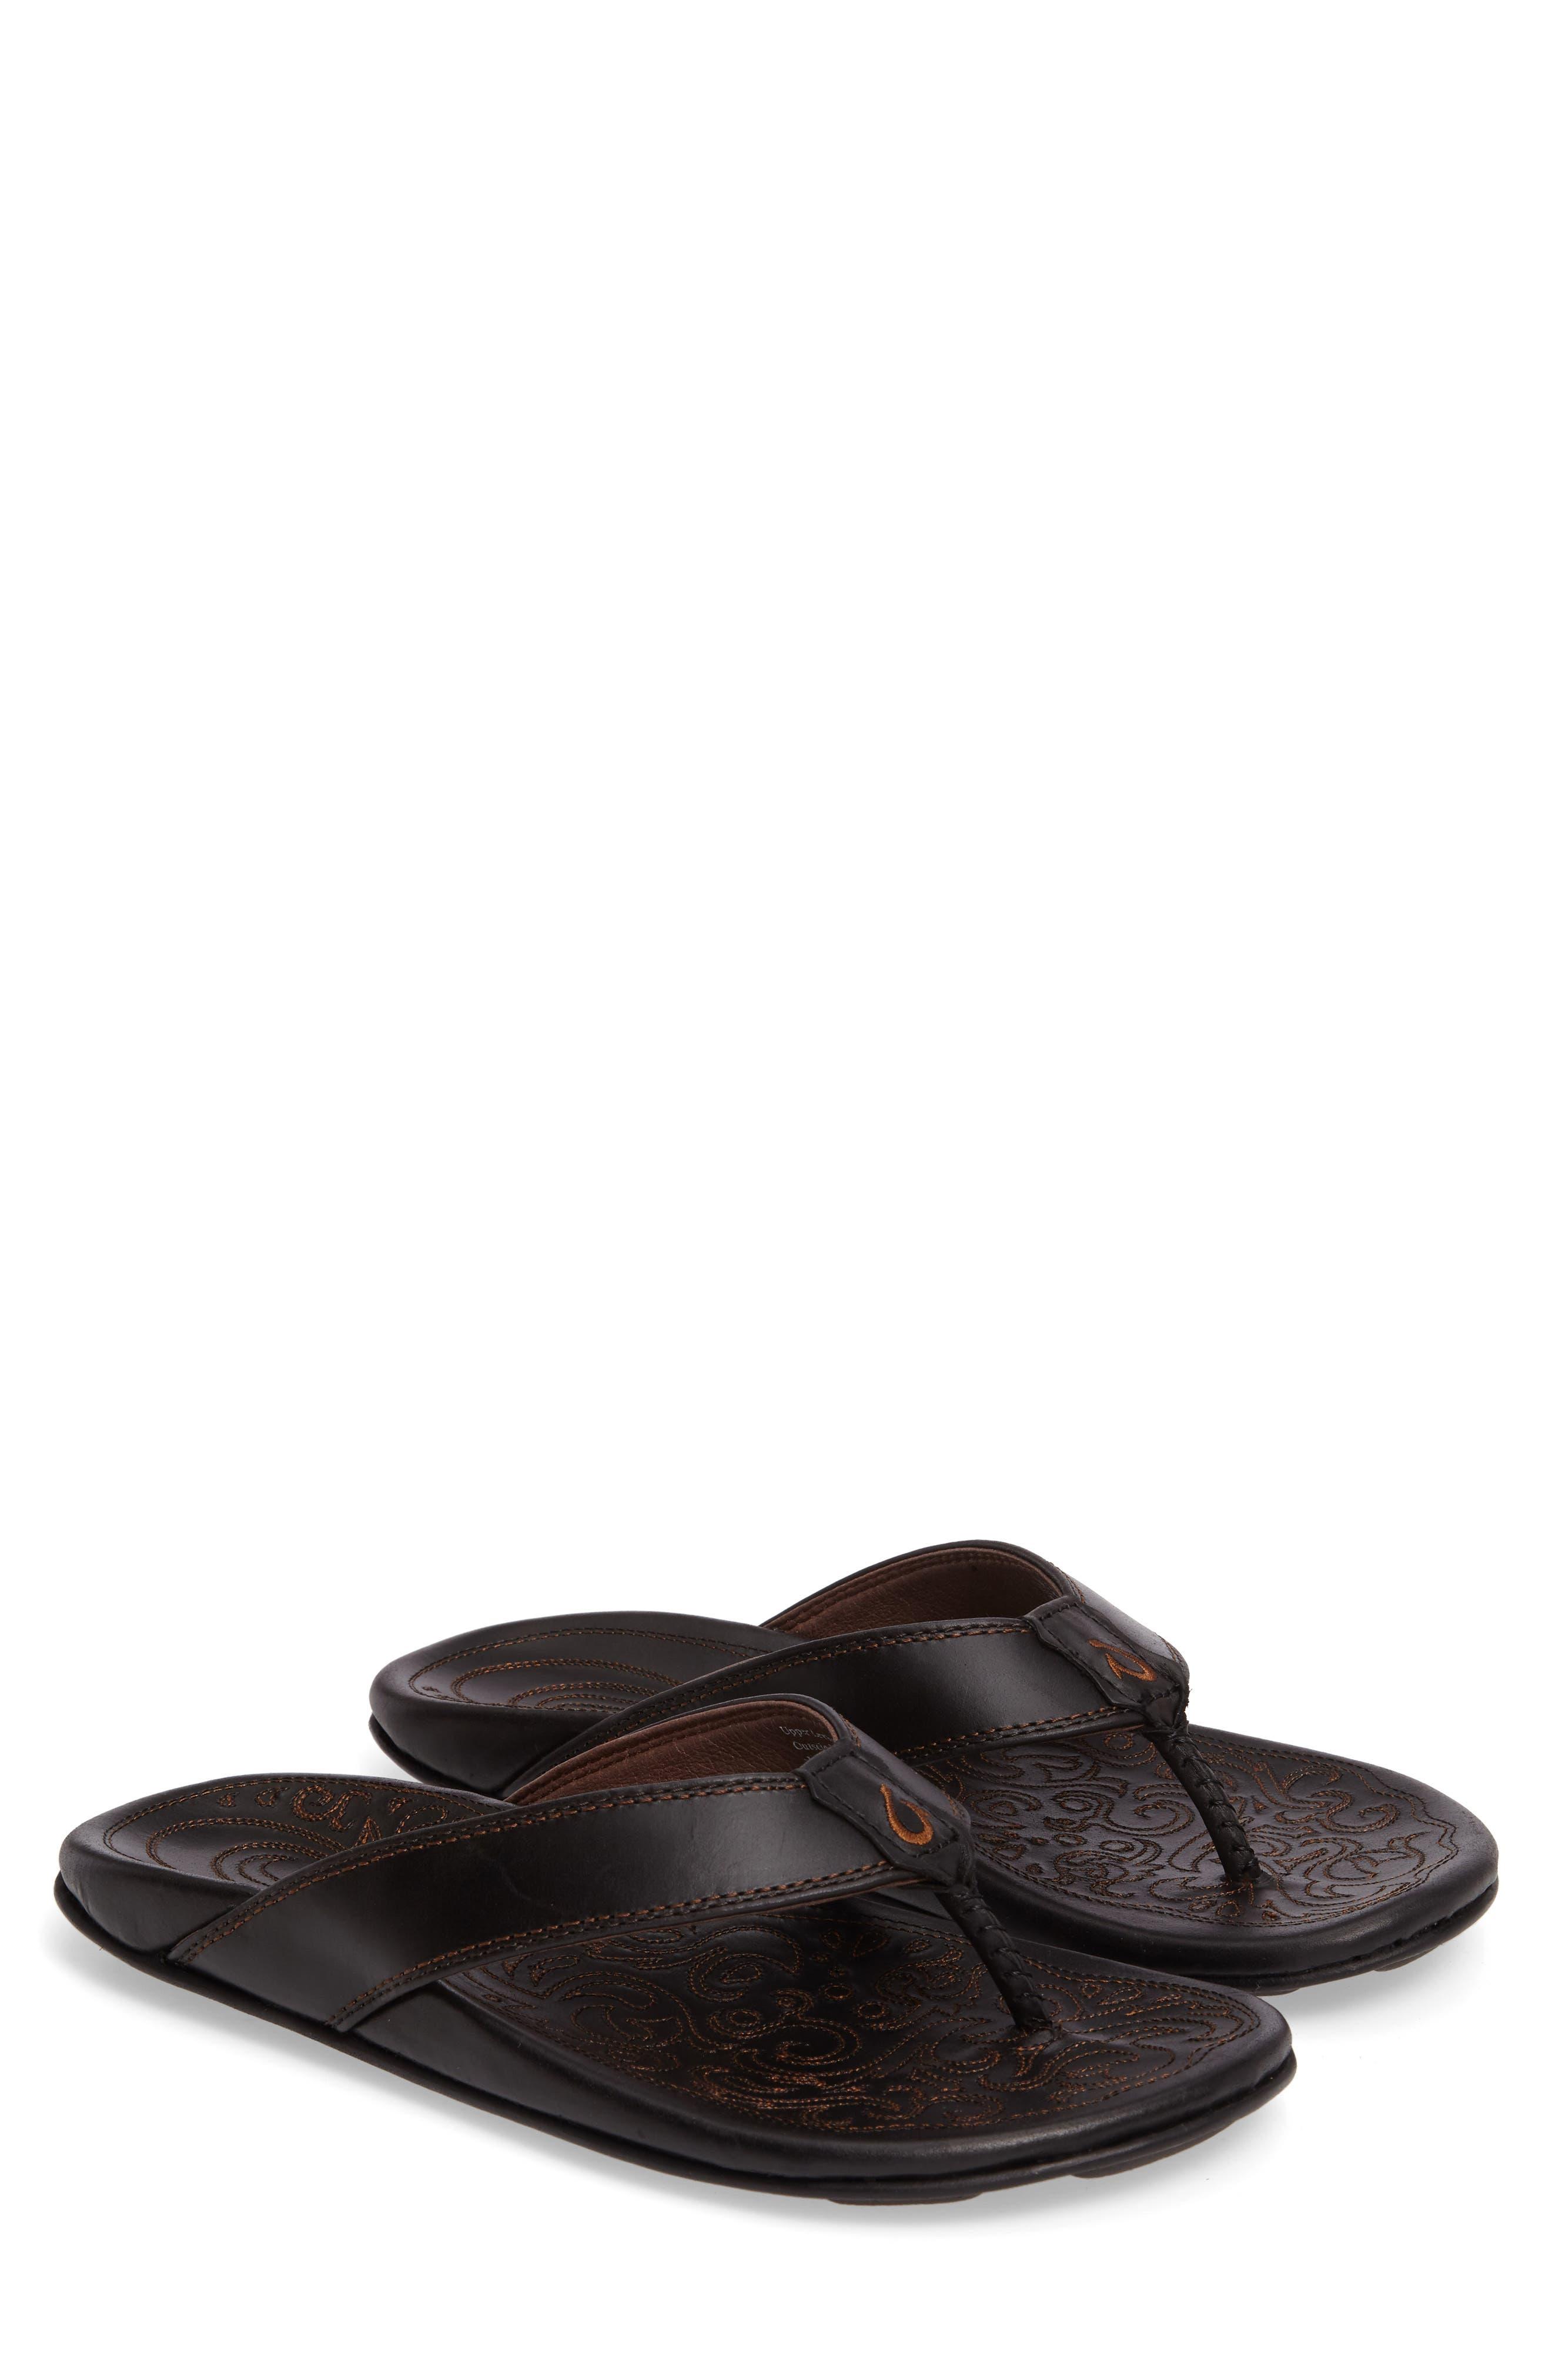 OLUKAI Waimea Flip Flop, Main, color, BLACK/ BLACK LEATHER